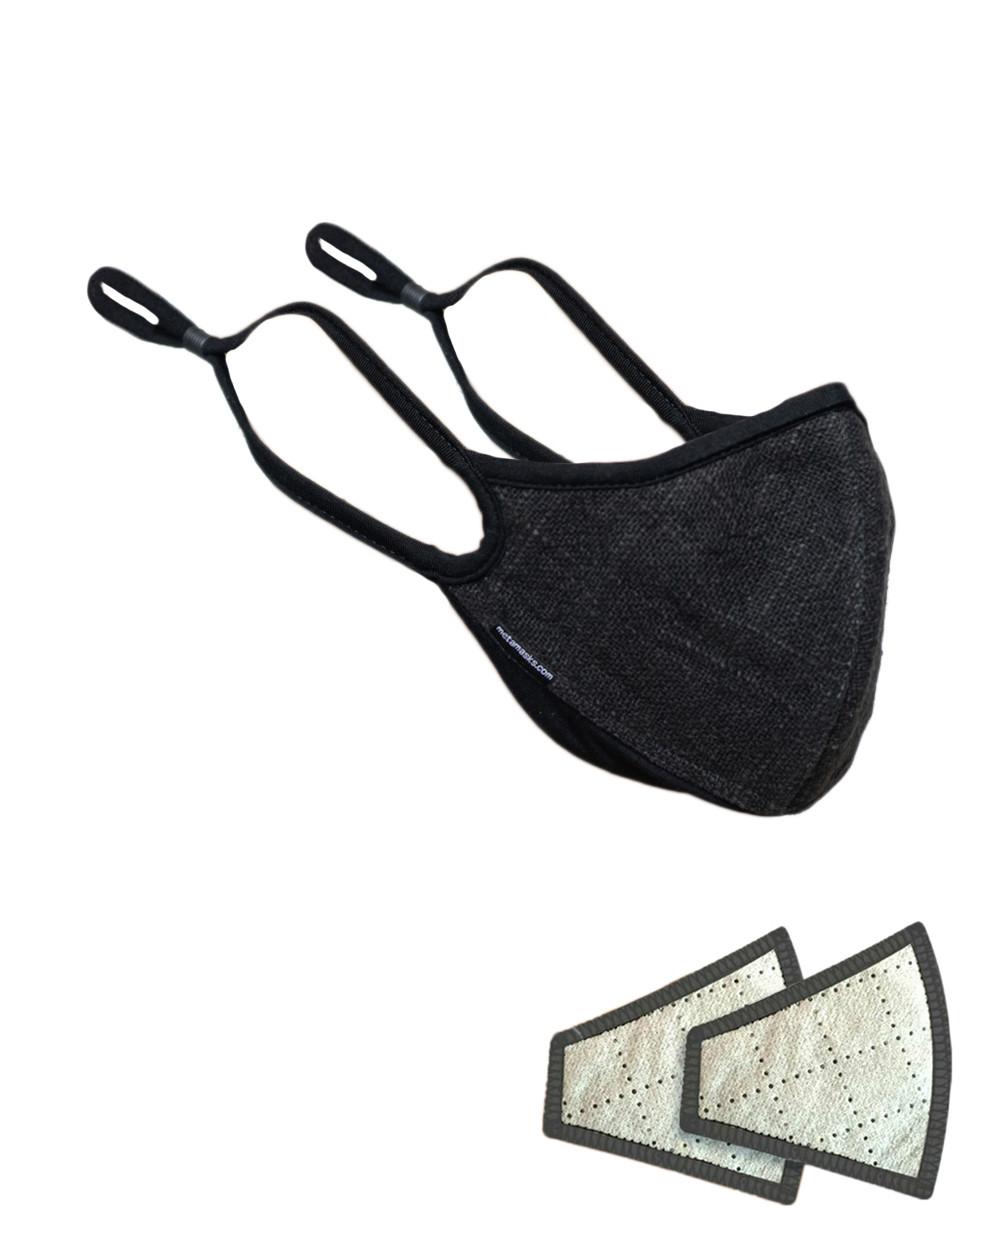 Marchio Metamasks Genere Donna Tipologia Mascherine Stagione Primavera/Esta…